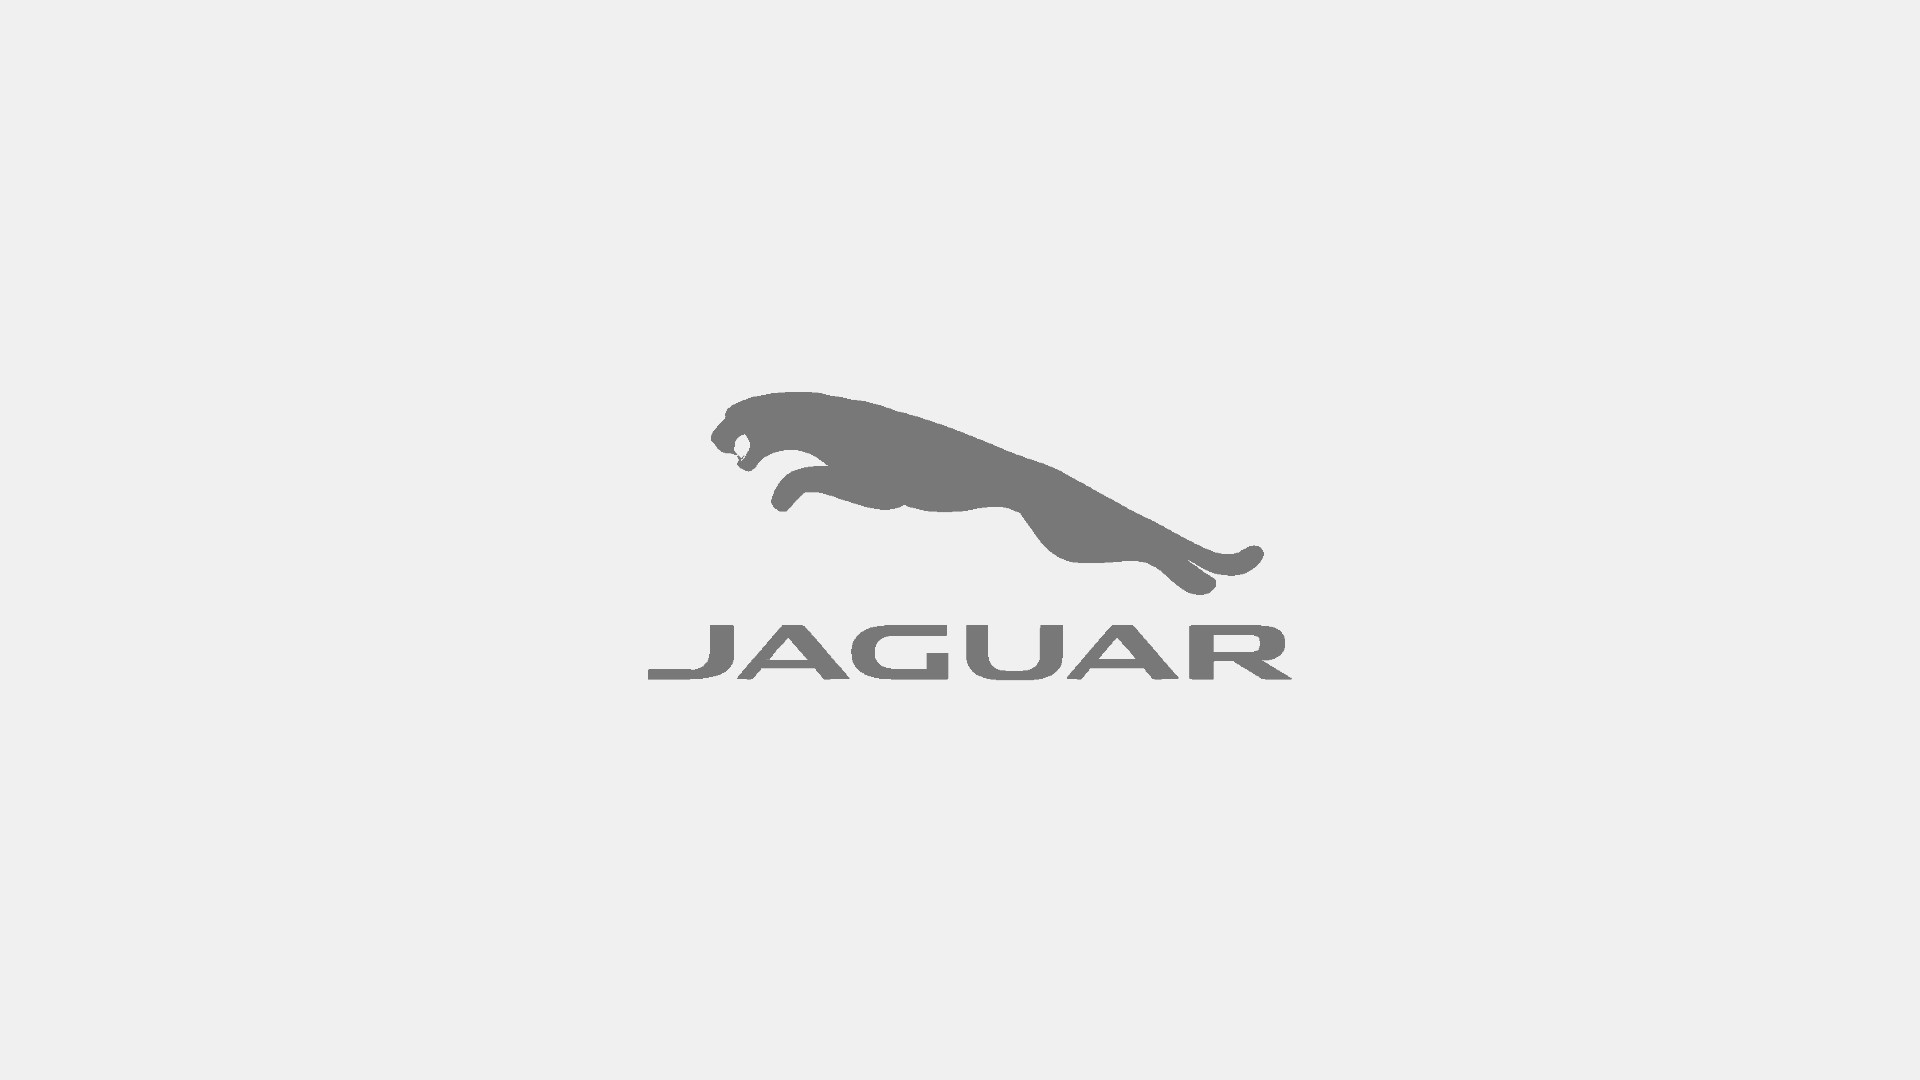 jaguar logo wallpapers 64 images